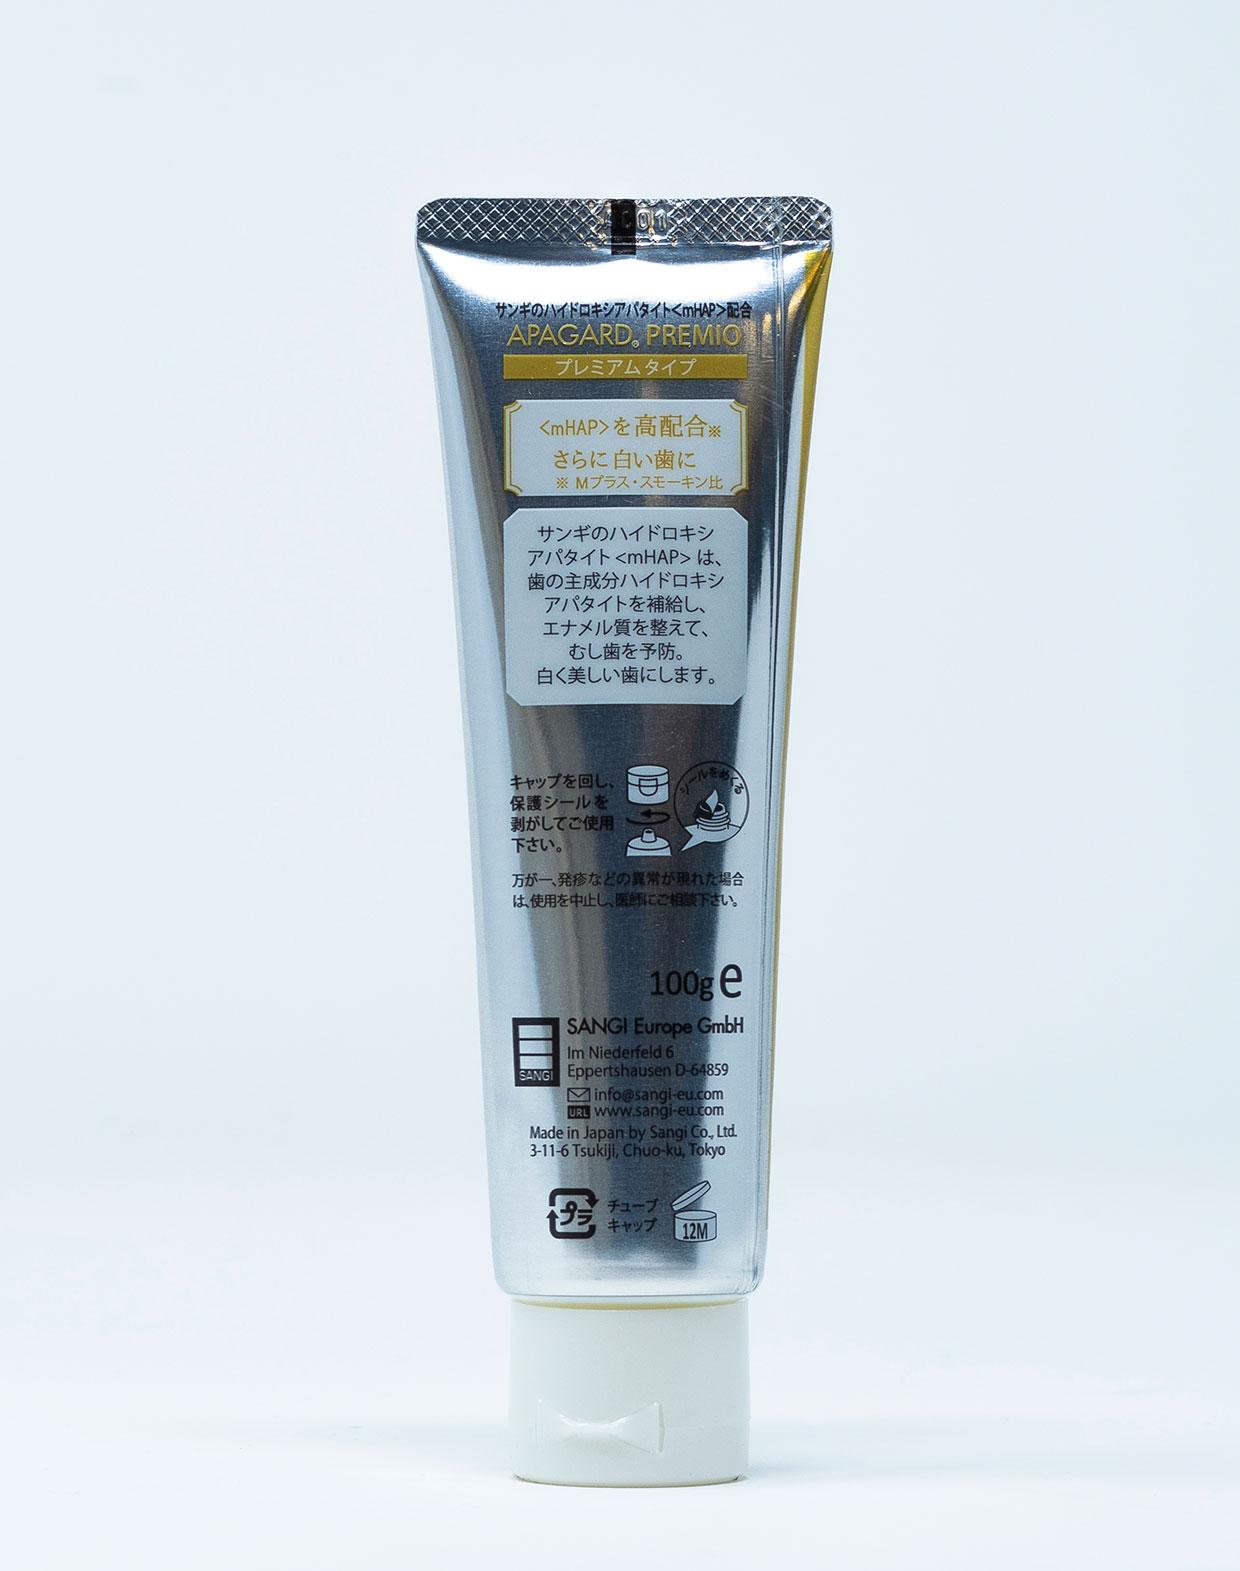 Apagard Dentifricio Premio – 100 g